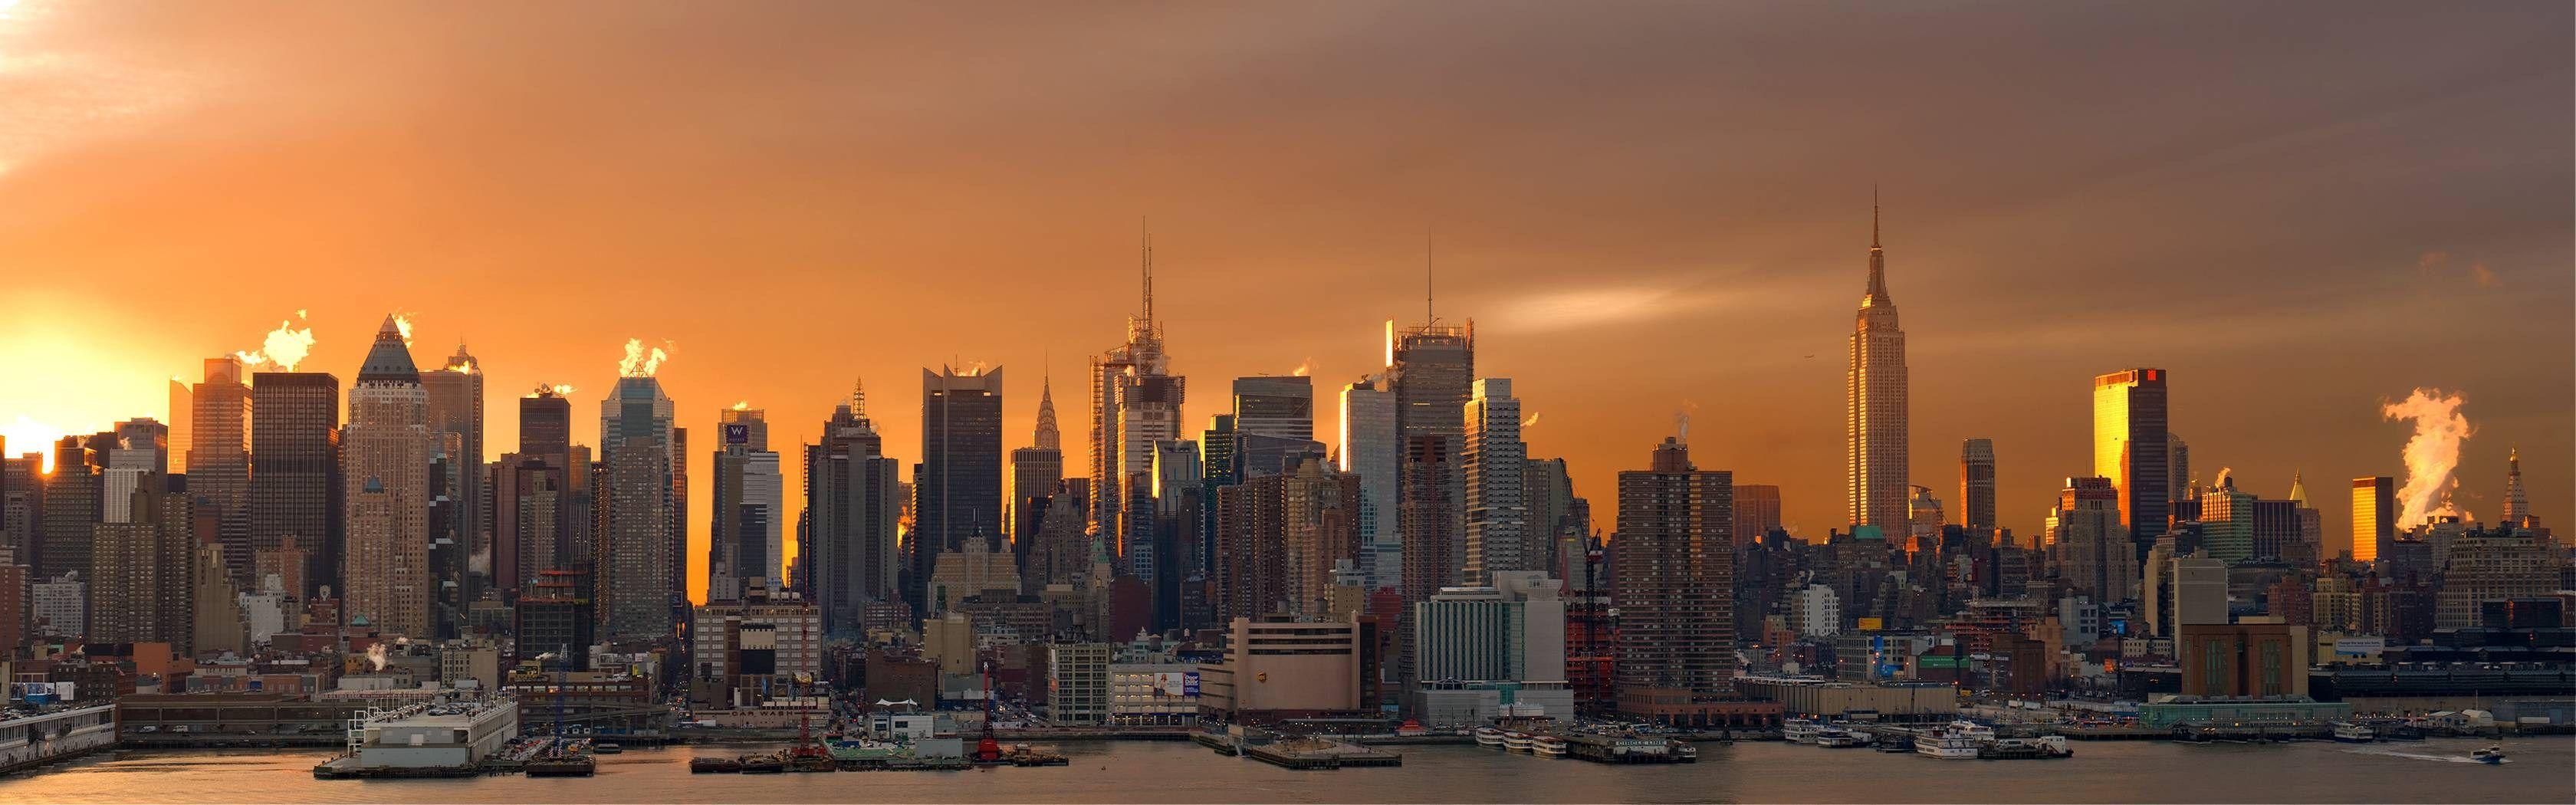 3360x1050 Background High Resolution City Nyc Skyline